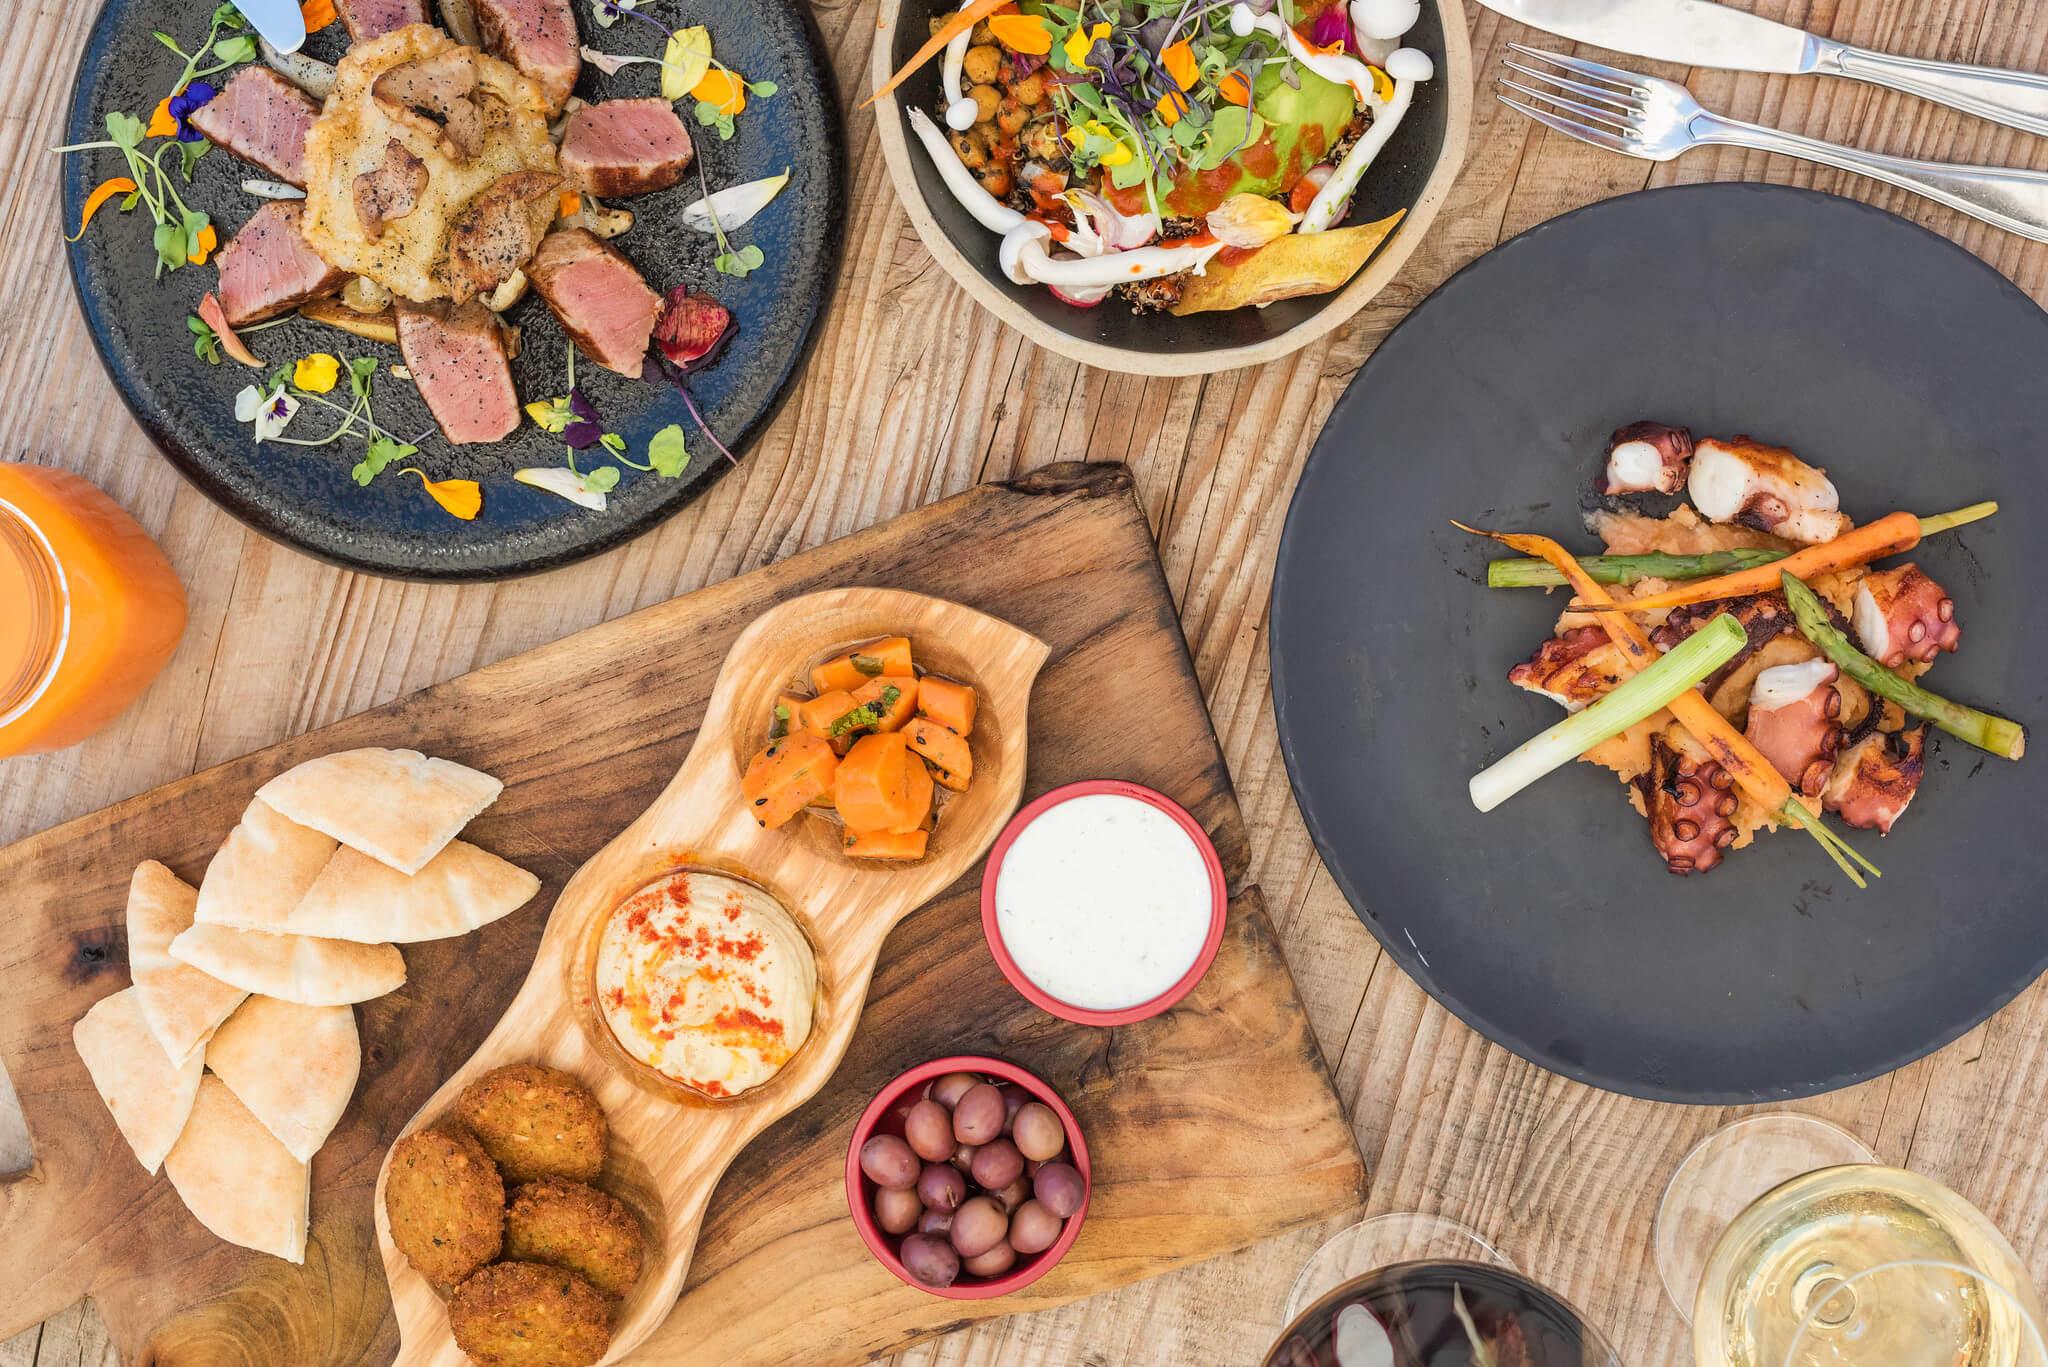 https://www.white-ibiza.com/wp-content/uploads/2020/03/white-ibiza-restaurants-es-cucons-10.jpg